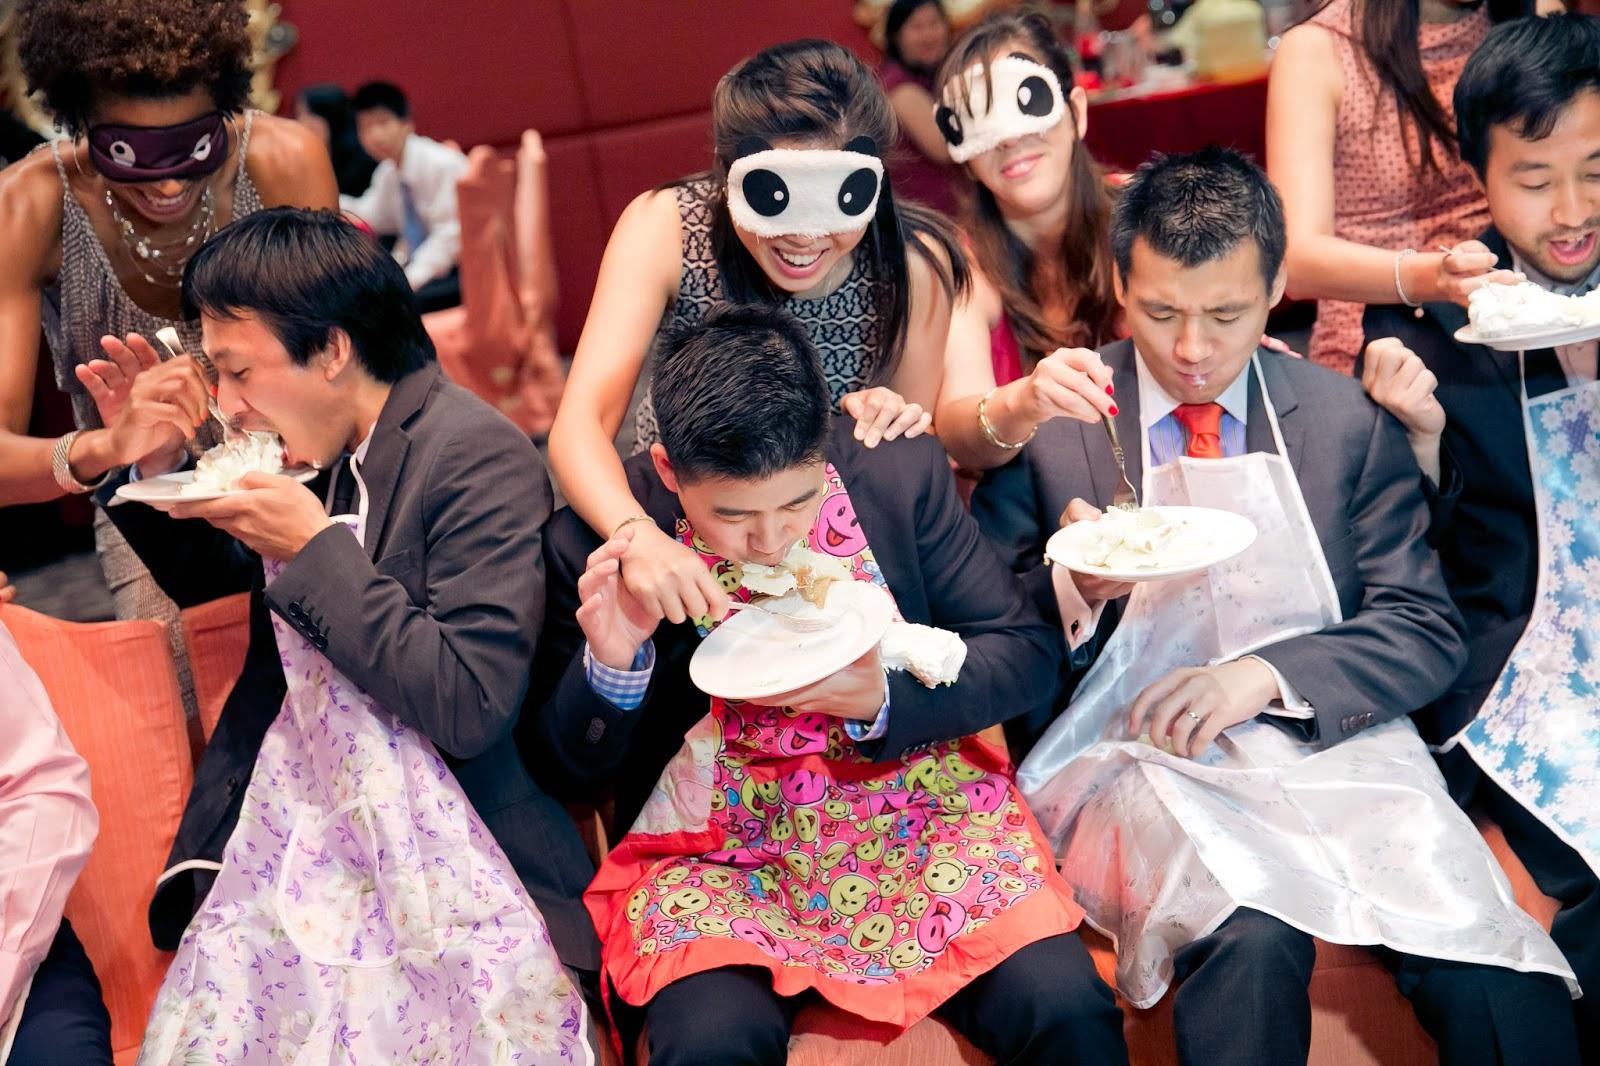 New York La Keiko Wedding Snapshots 6 The Chinese Wedding